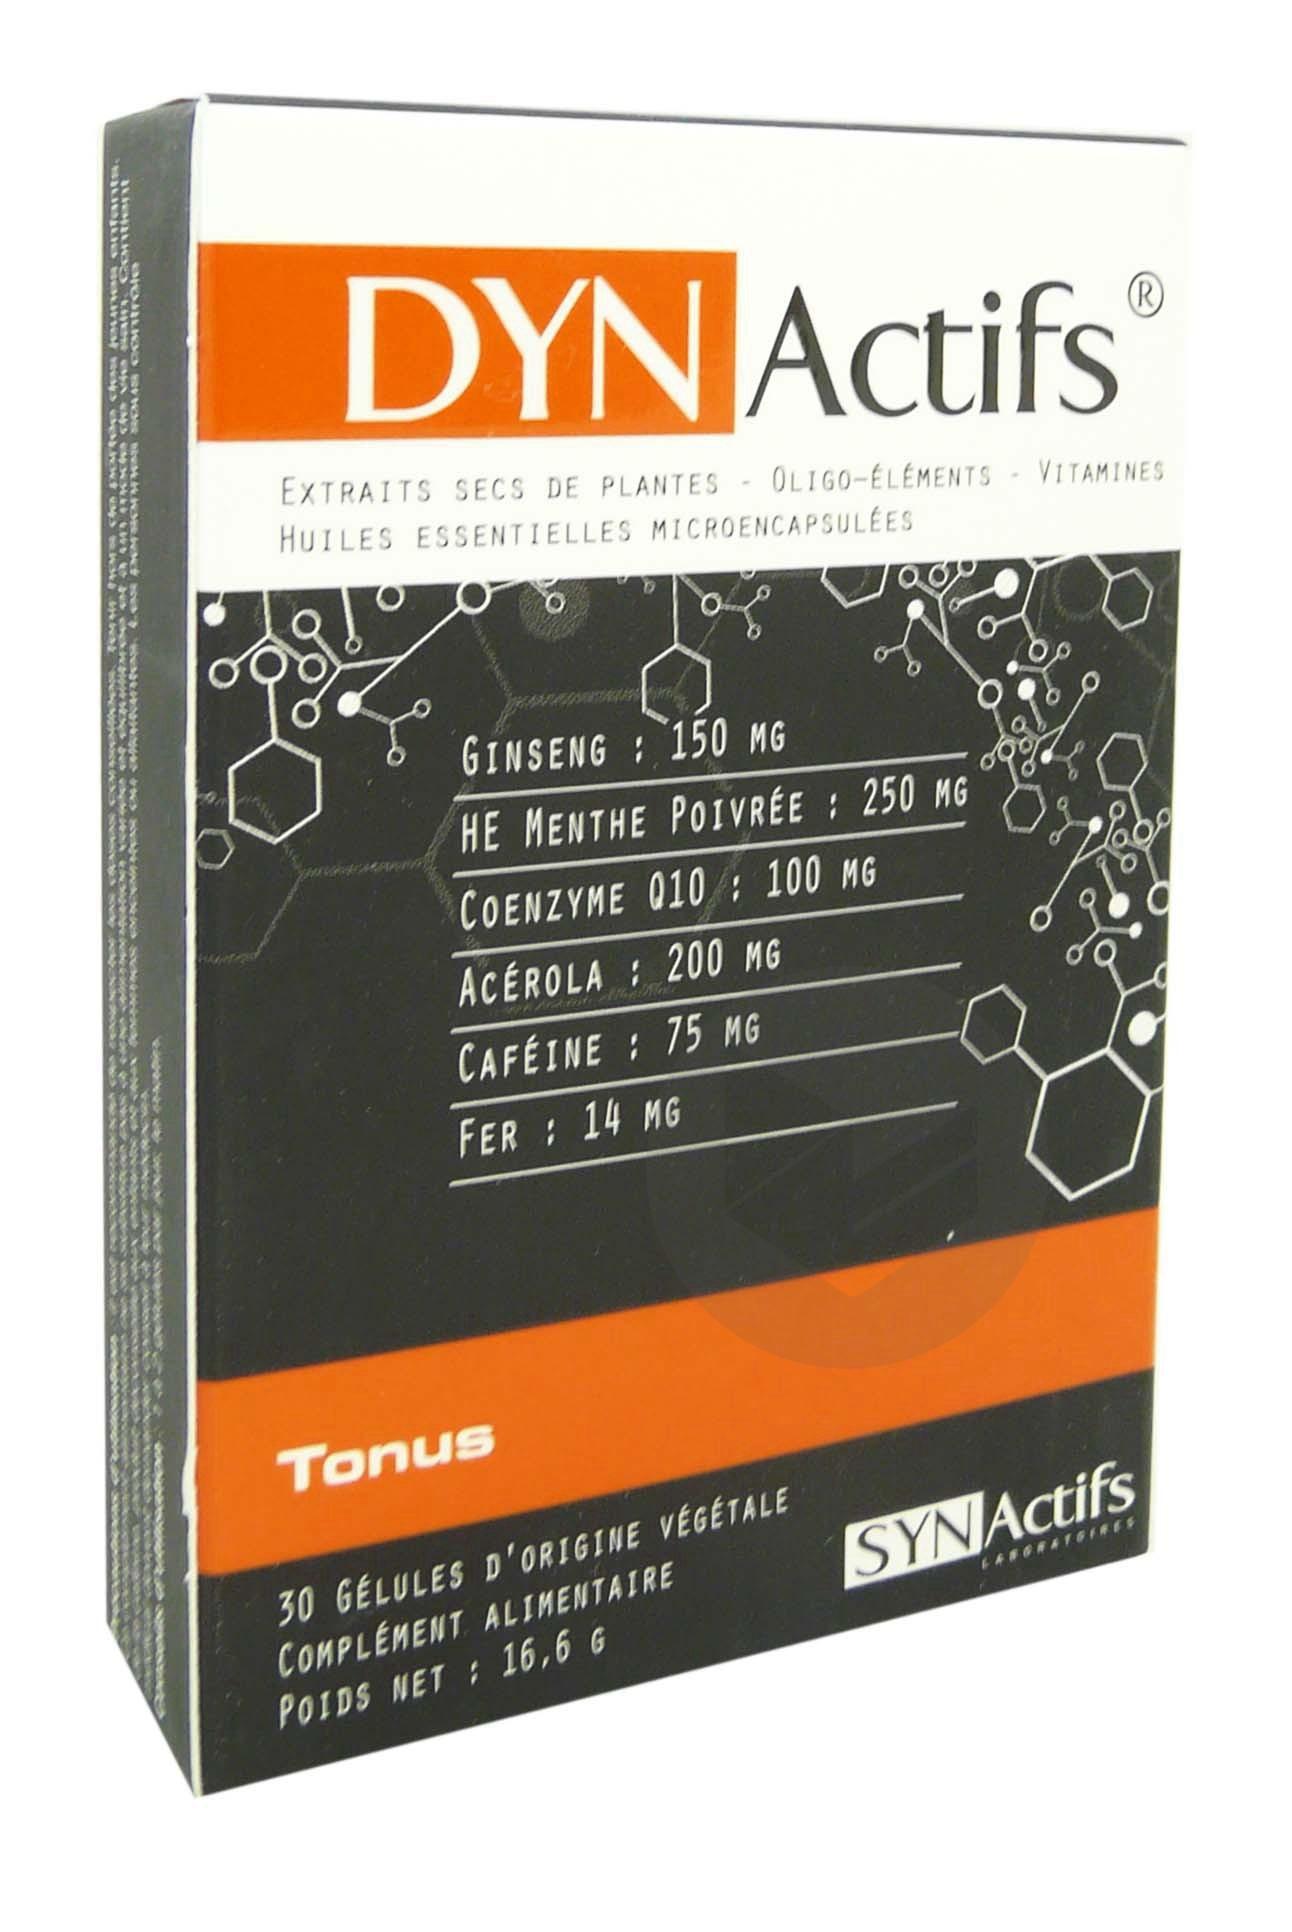 SYNACTIFS DYNACTIFS 30 gélules